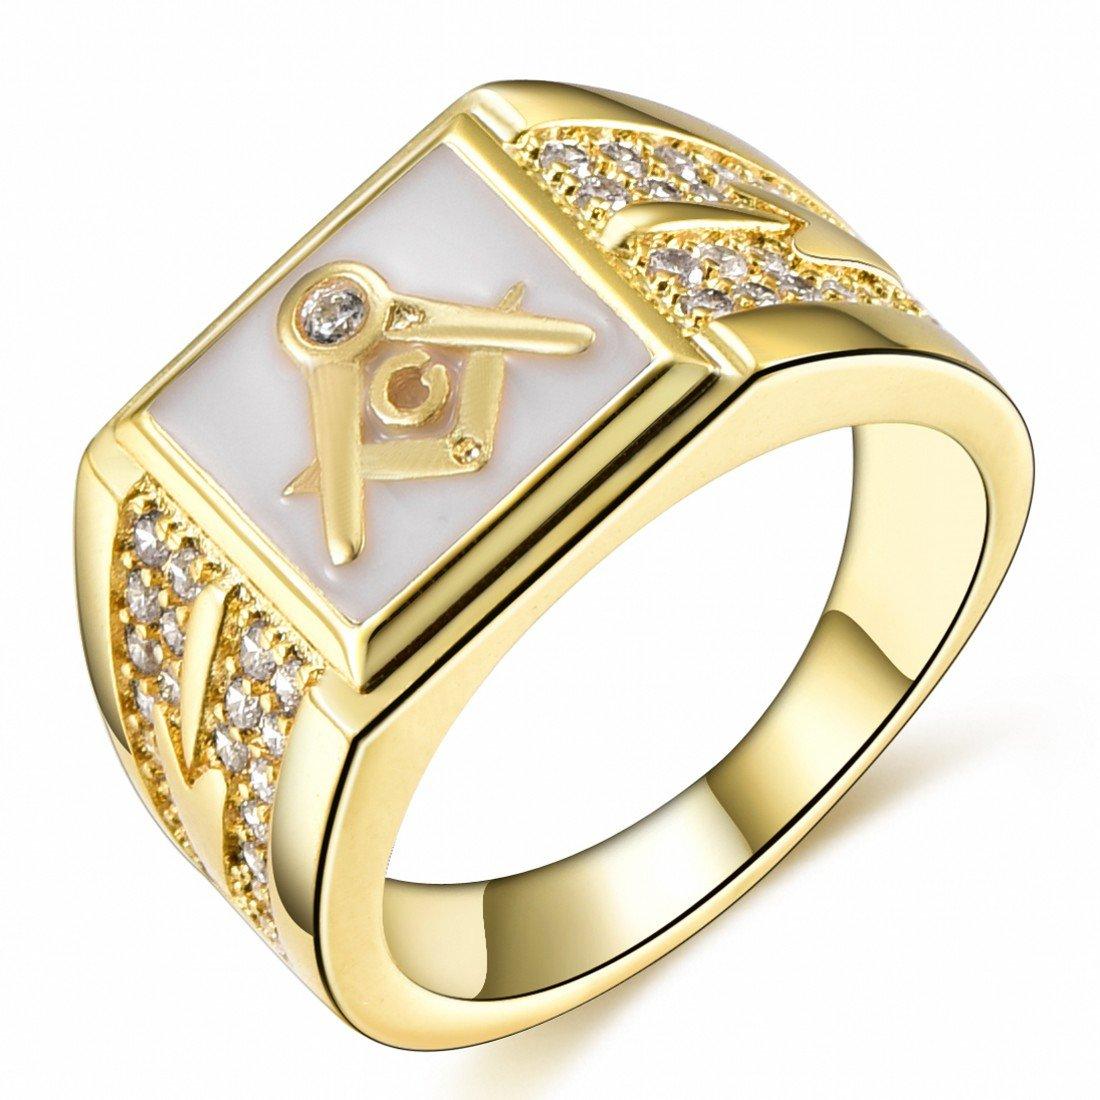 Songdetao 18K Gold Plate Men's Masonic White Lodge Mason Crystal Freemason Rings Sz 8